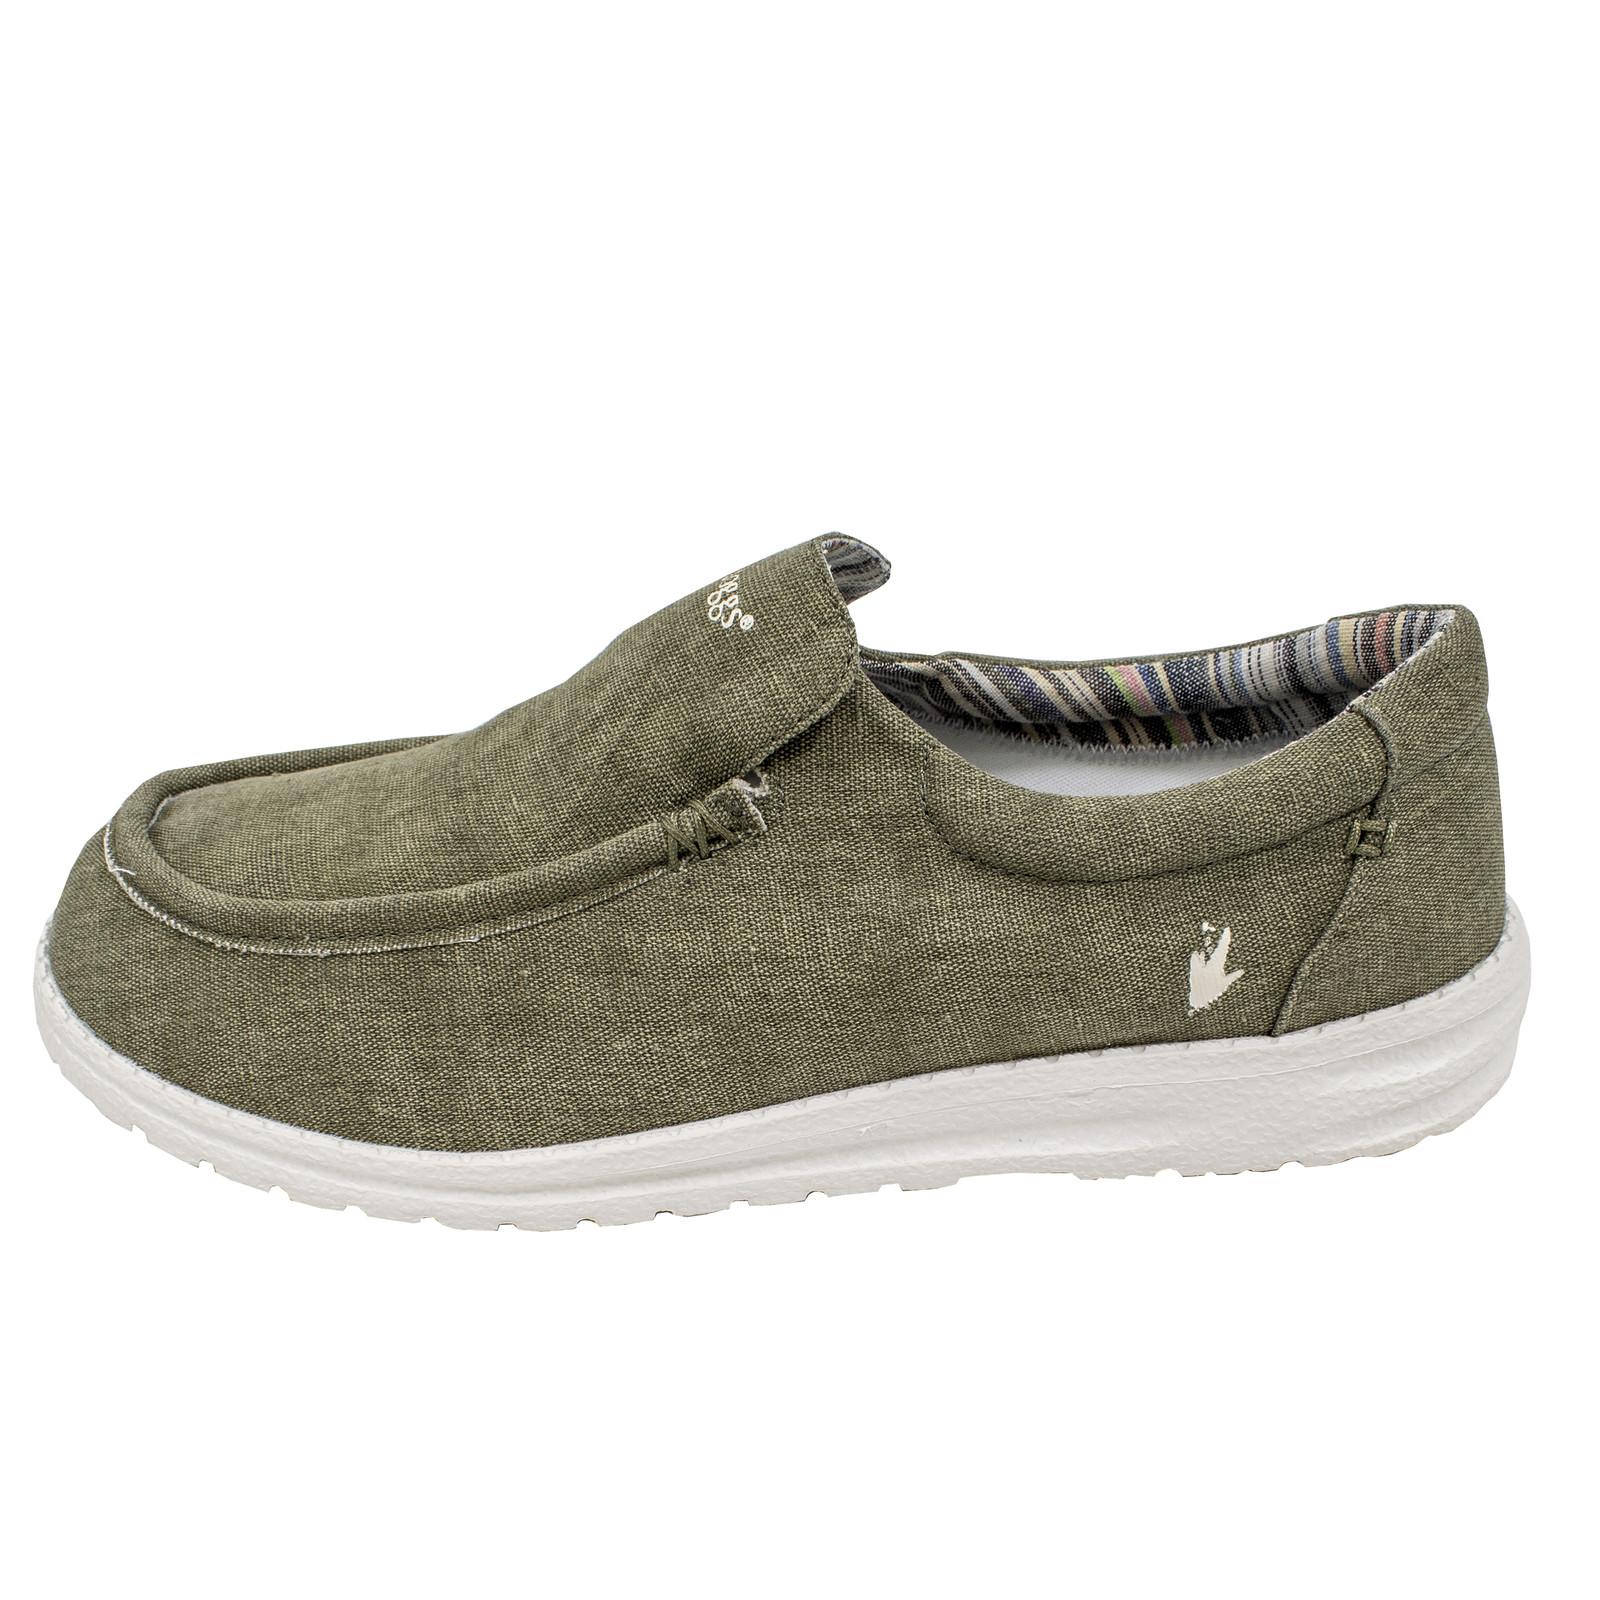 Men's Java Casual Slip-On Shoe Olive-large